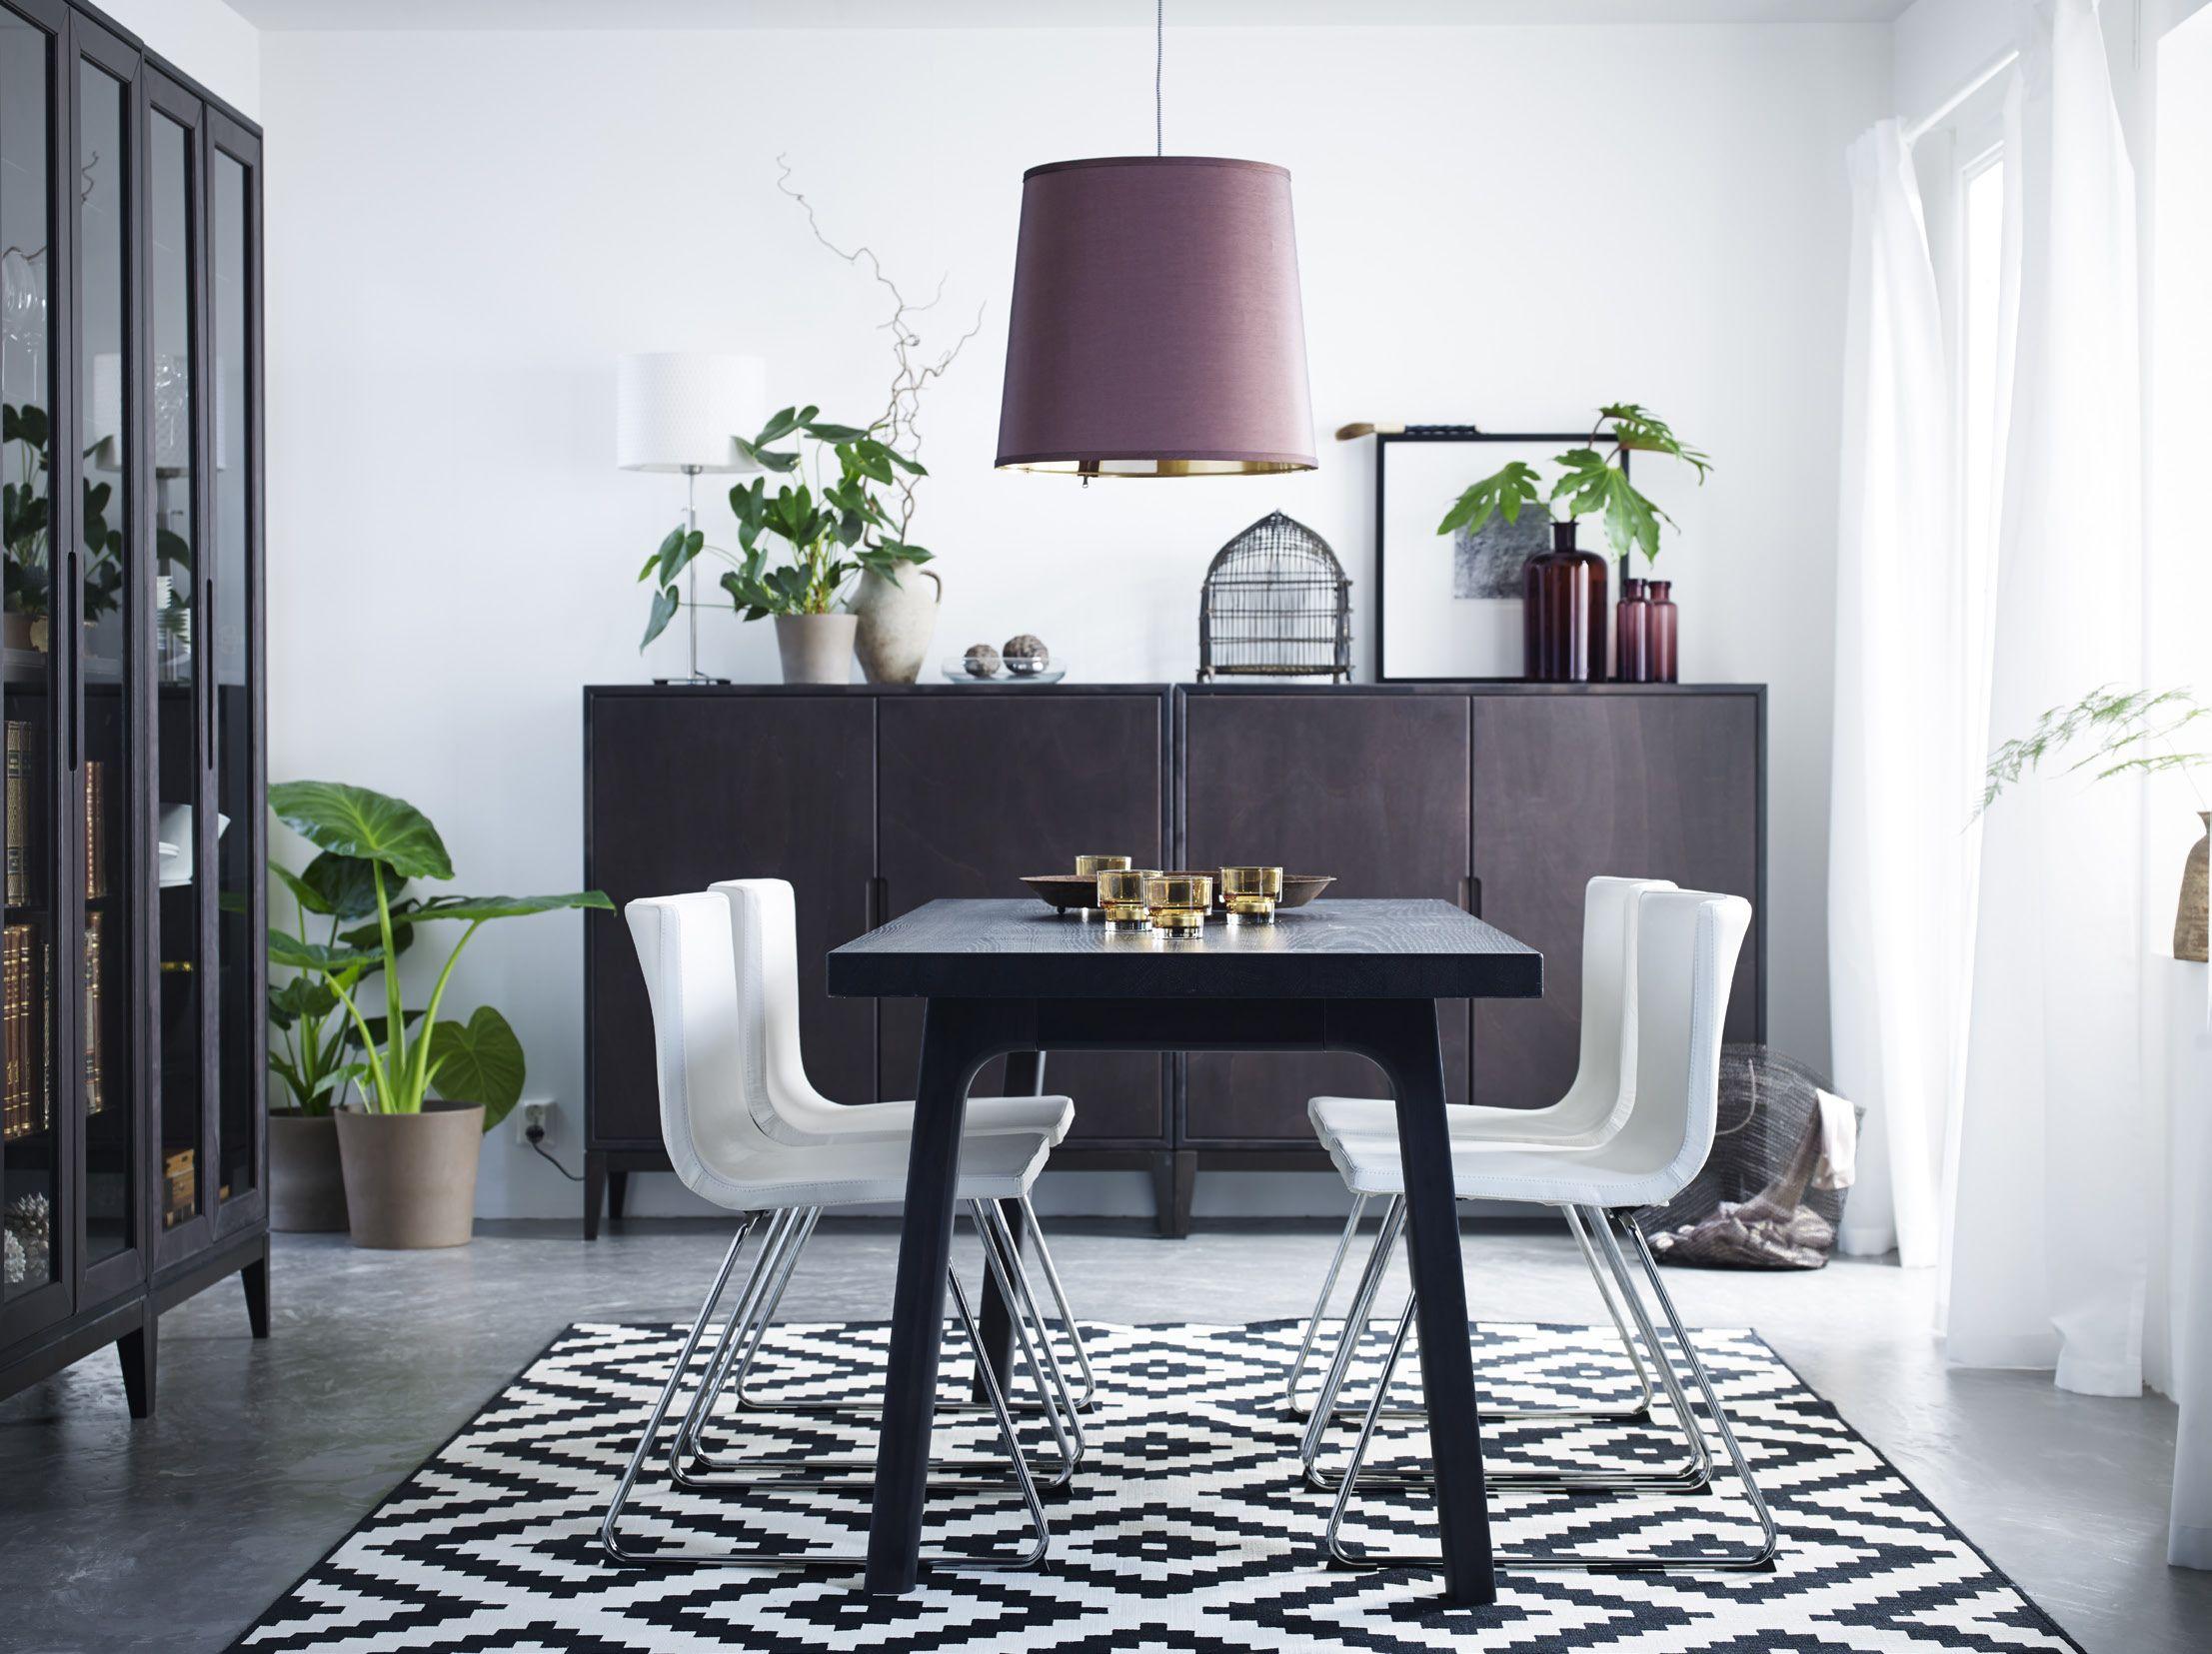 VÄSTANBY Tafel, donkerbruin, Västanå donkerbruin | Ikea, Ikea and ...